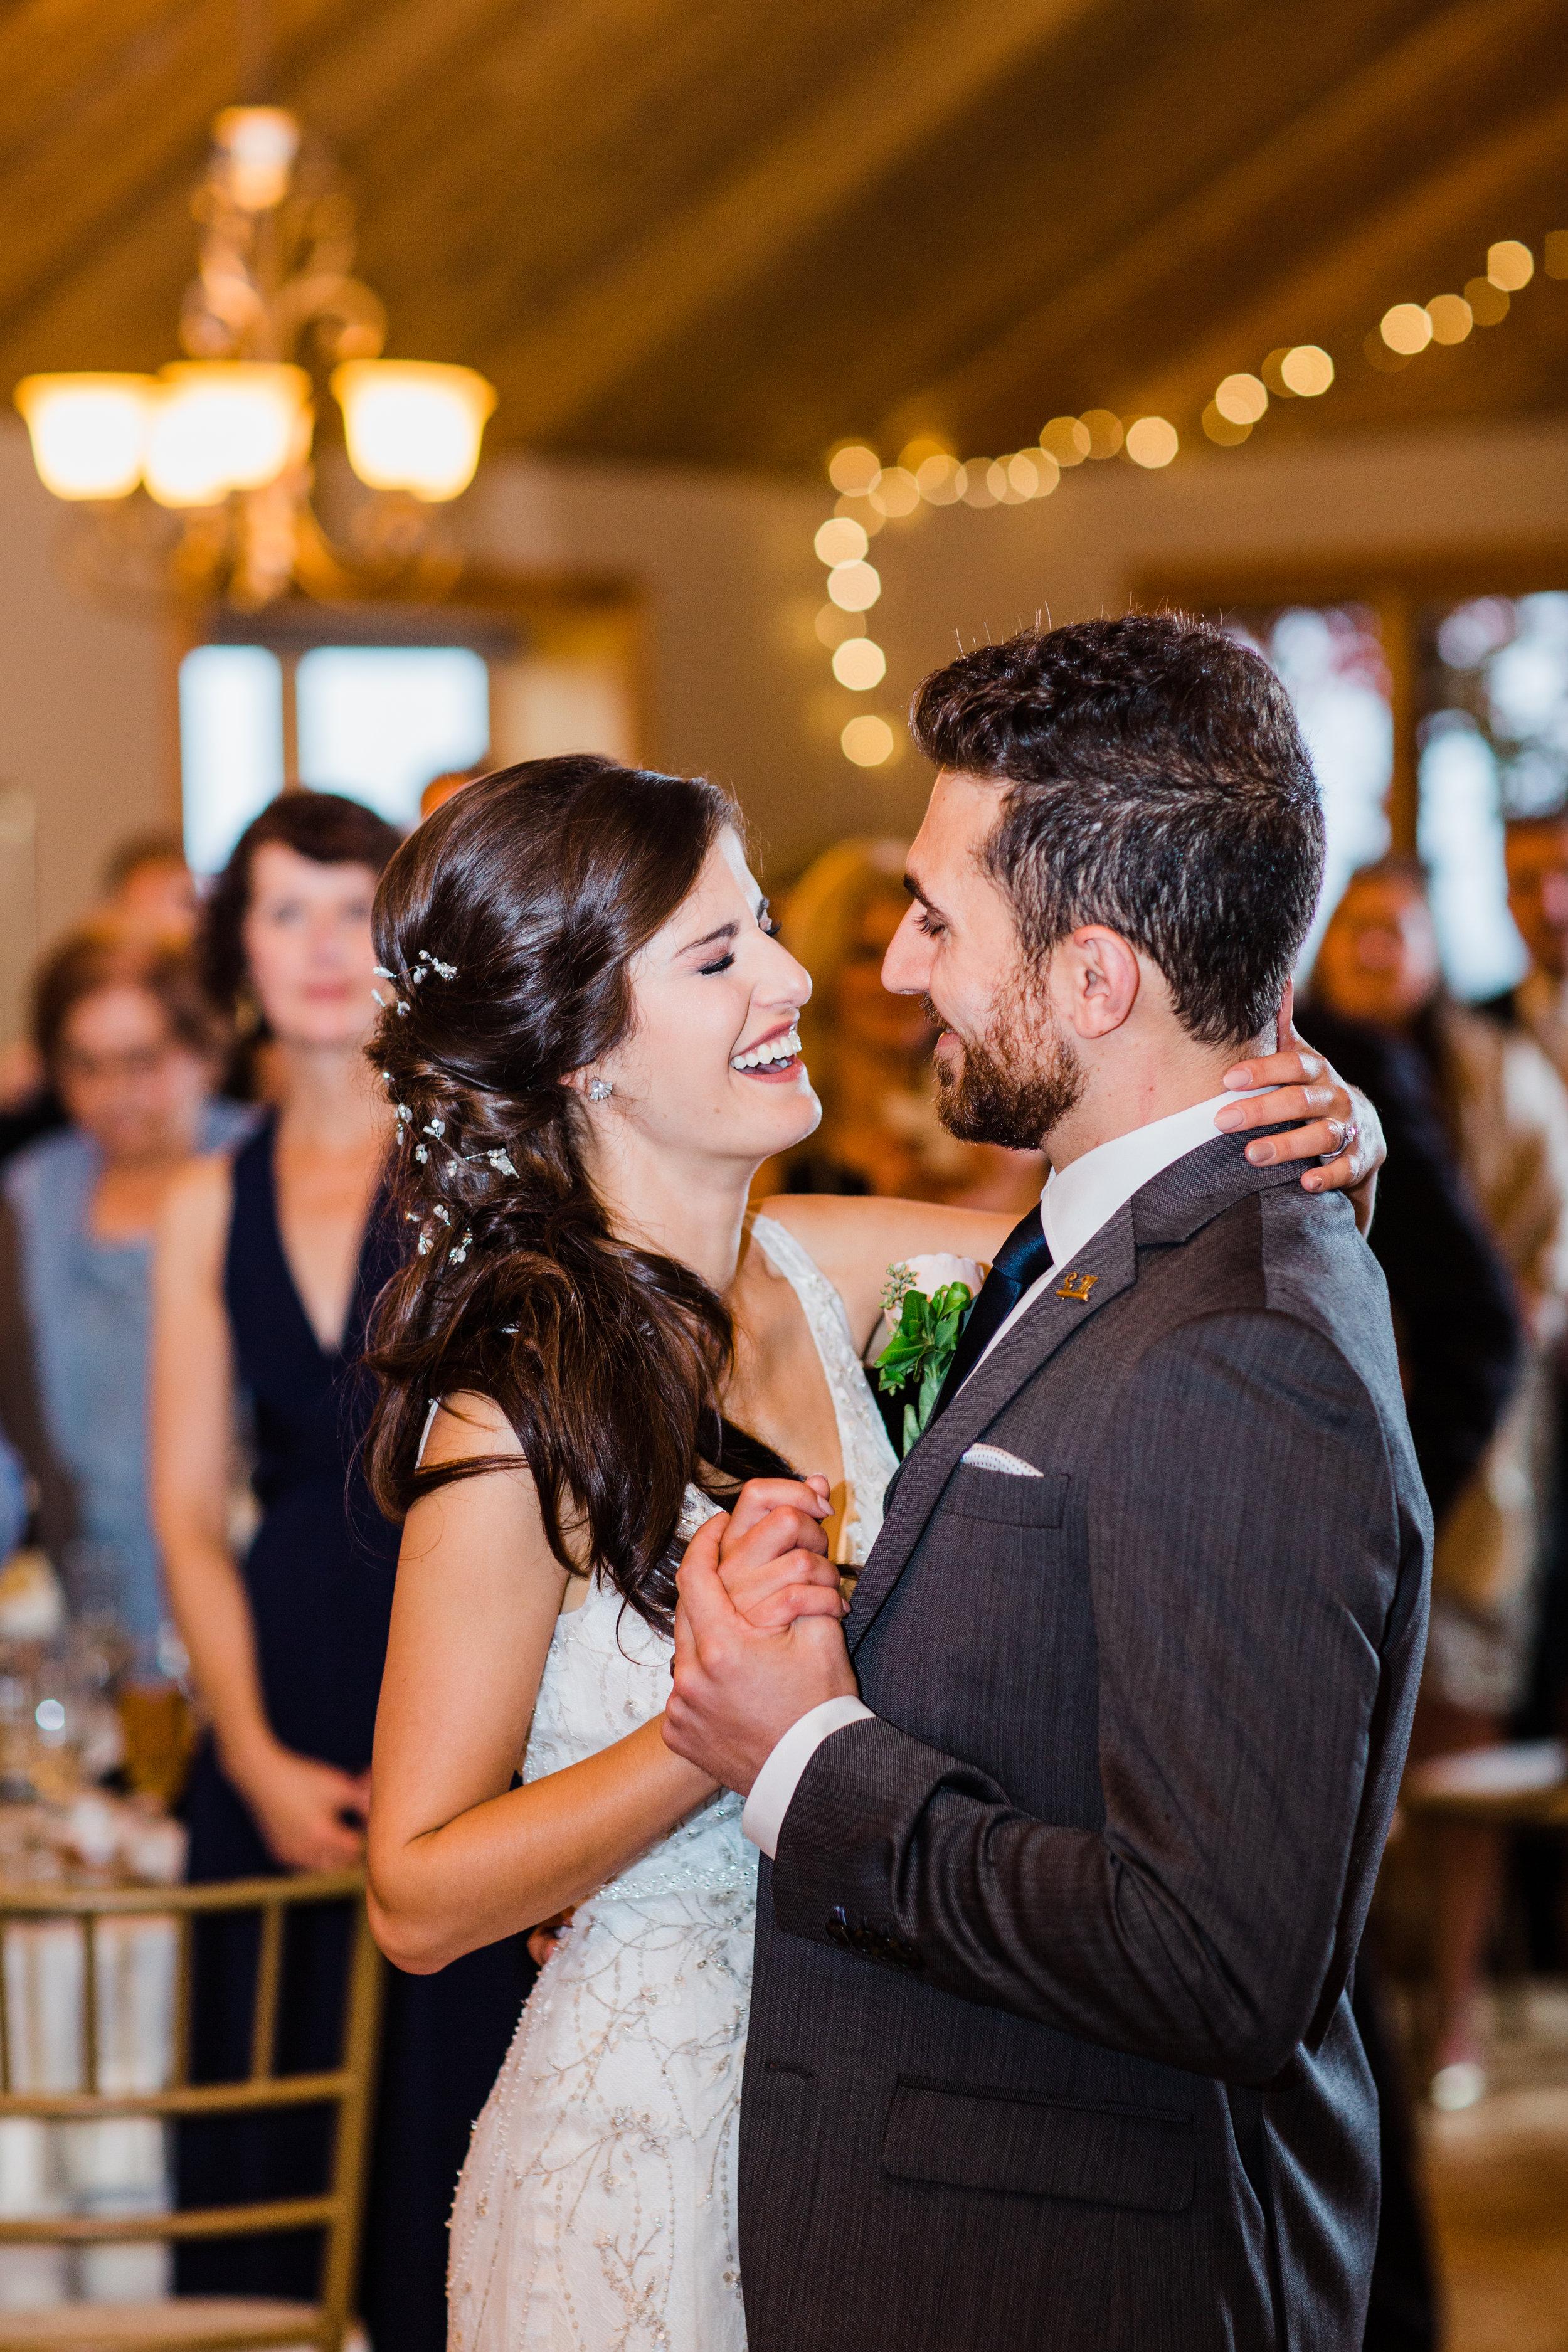 Amir-Golbazi-Danielle-Giroux-Photography_Toronto-Wedding_Cedarwood_Rachel-Paul_606.jpg